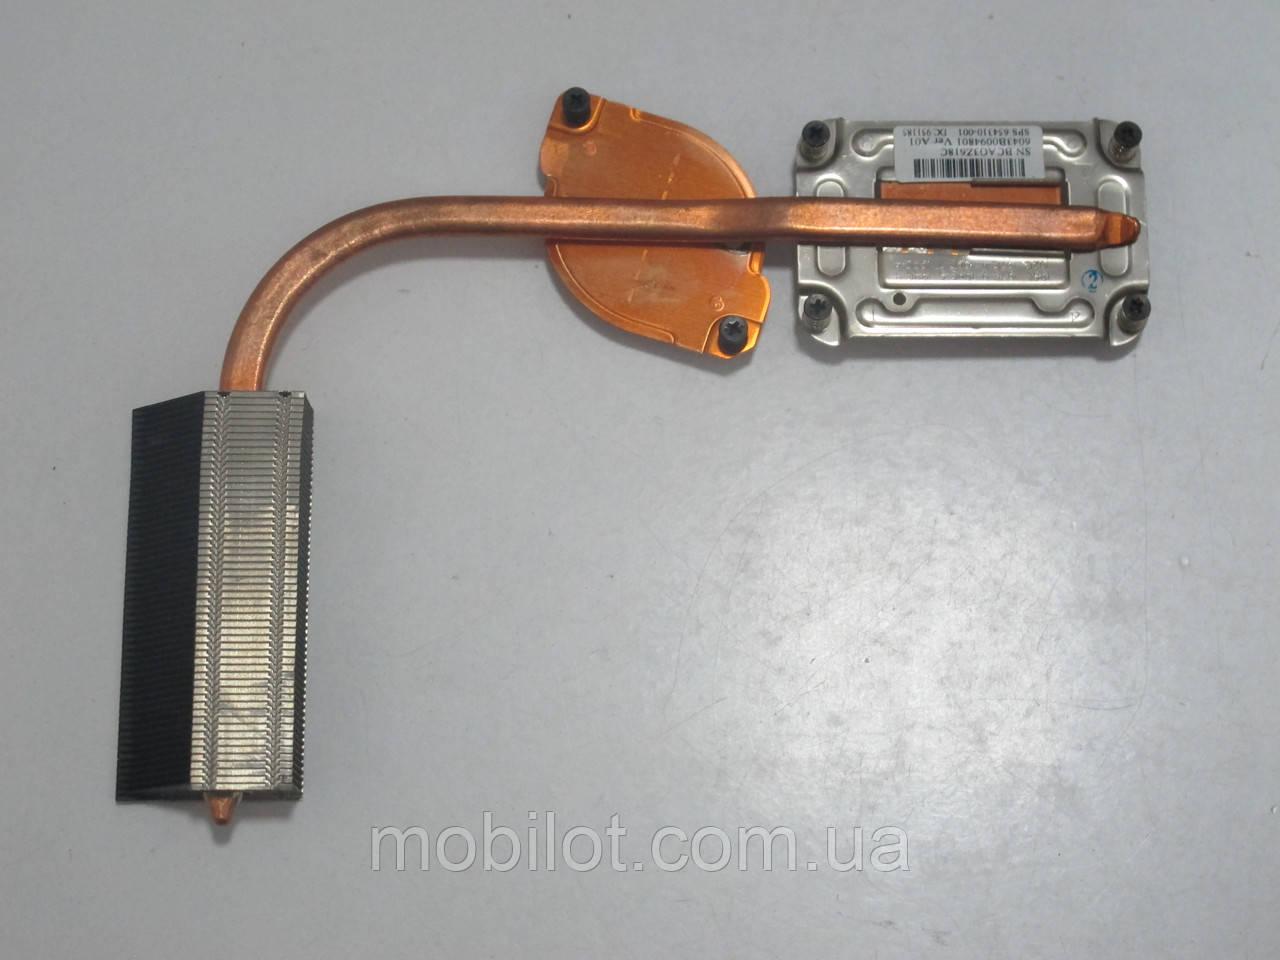 Система охлаждения HP 4535s (NZ-7070)